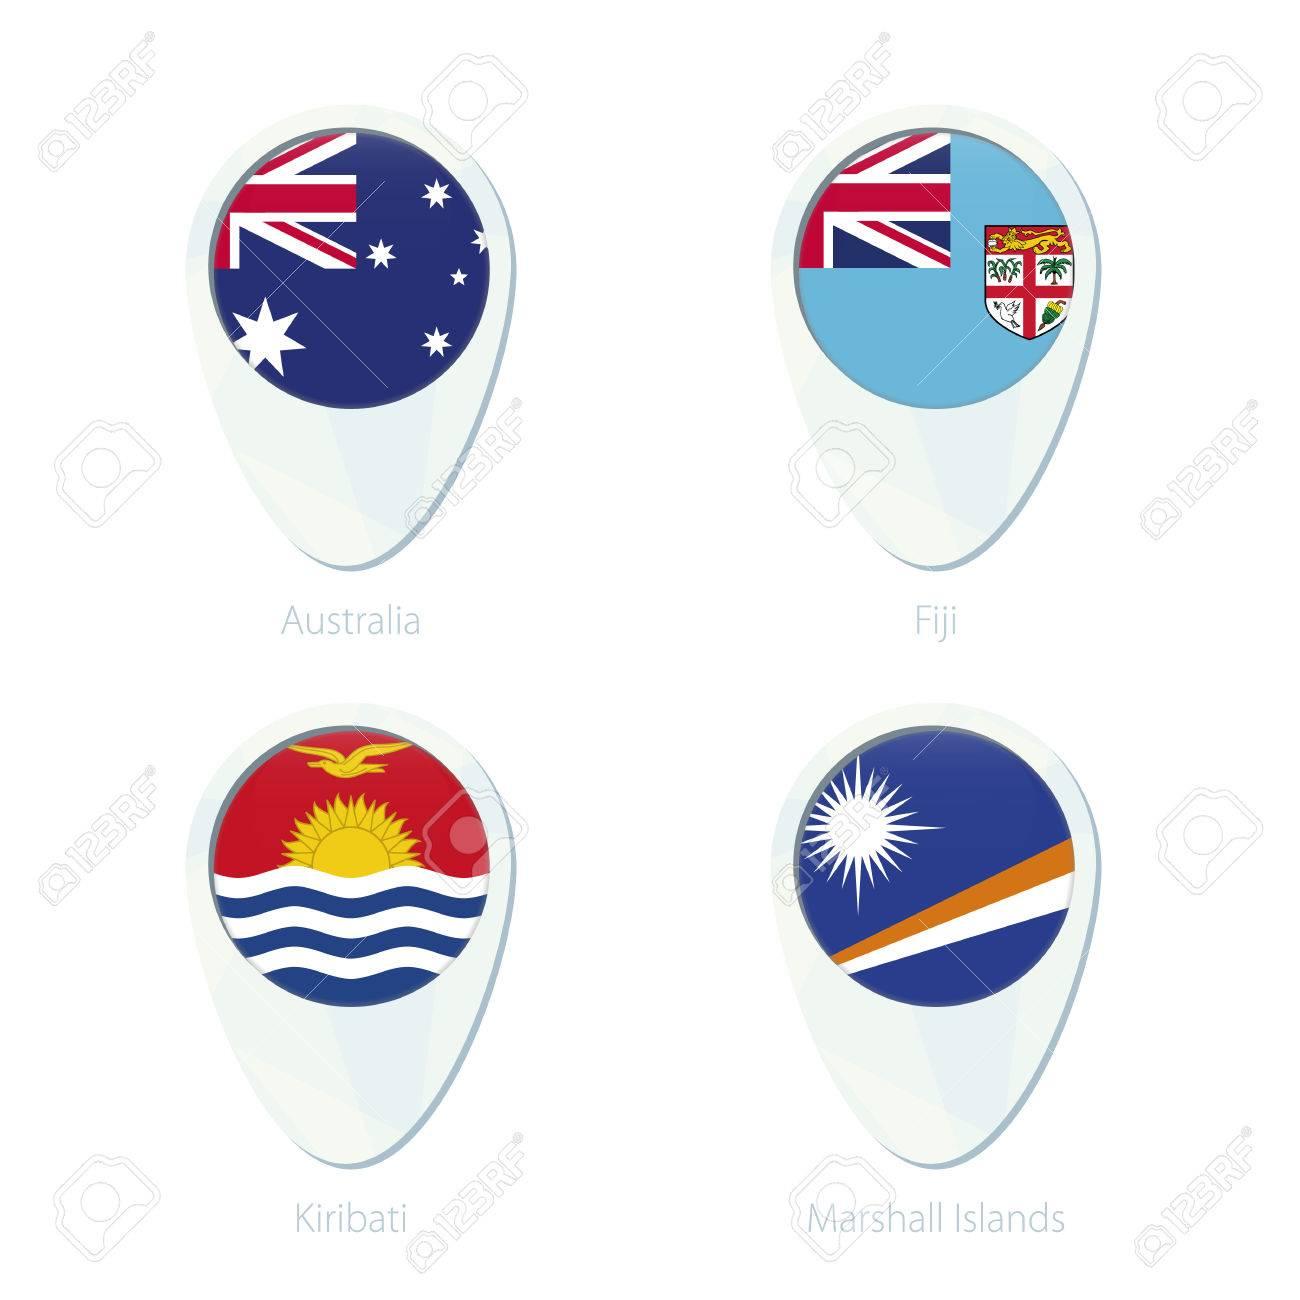 Australia, Fiji, Kiribati, Marshall Islands flag location map..